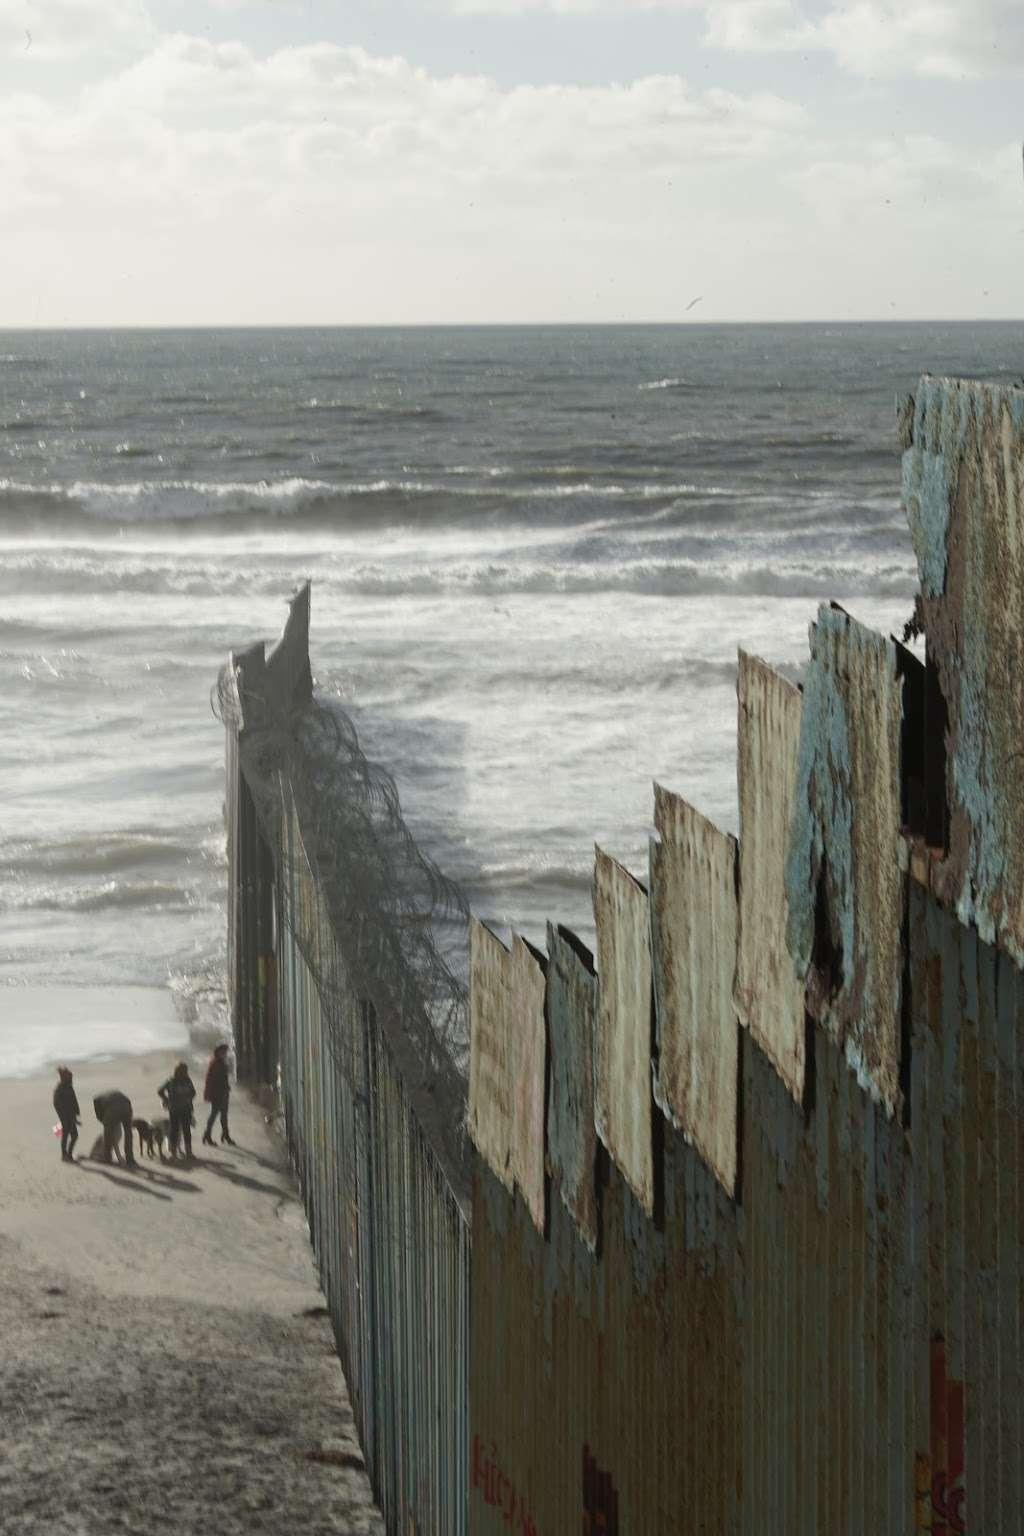 El Muro en la Playa, Tijuana - museum  | Photo 3 of 10 | Address: Faro, Monumental, Tijuana, B.C.